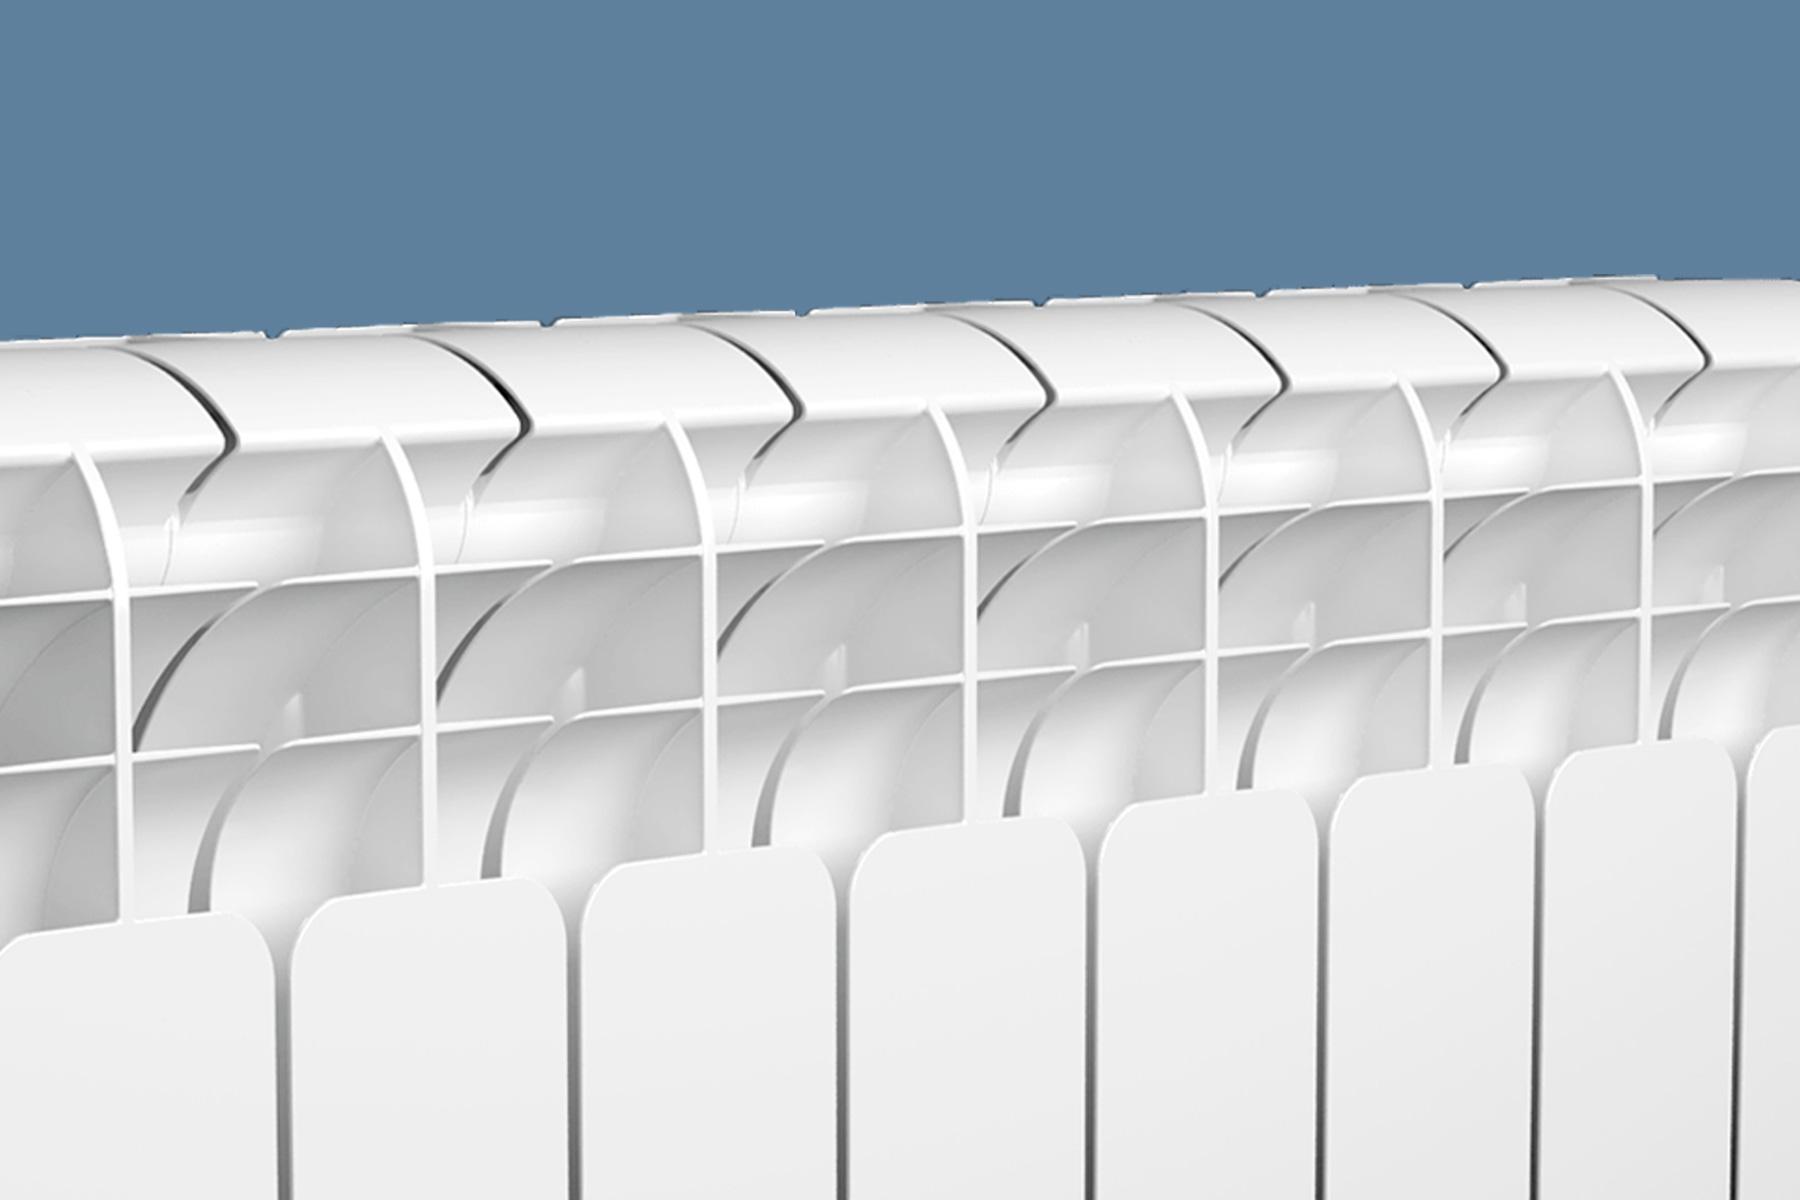 https://www.fl-impianti.it/wp-content/uploads/2021/01/radiatore.jpg